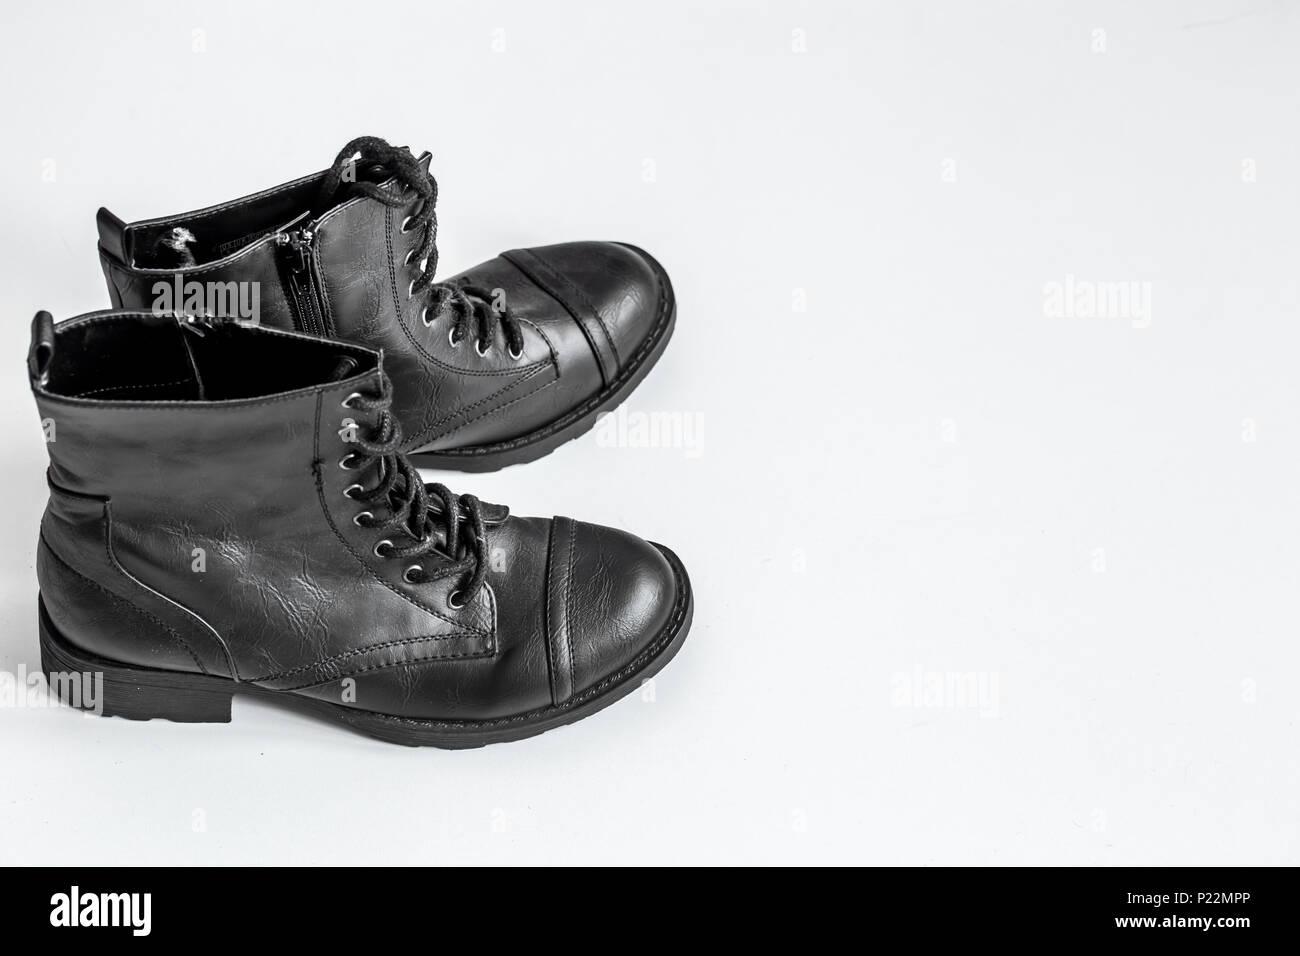 Skinhead Stockfotosamp; Shoe Boot Shoe Boot Footwear MpGVjzSULq